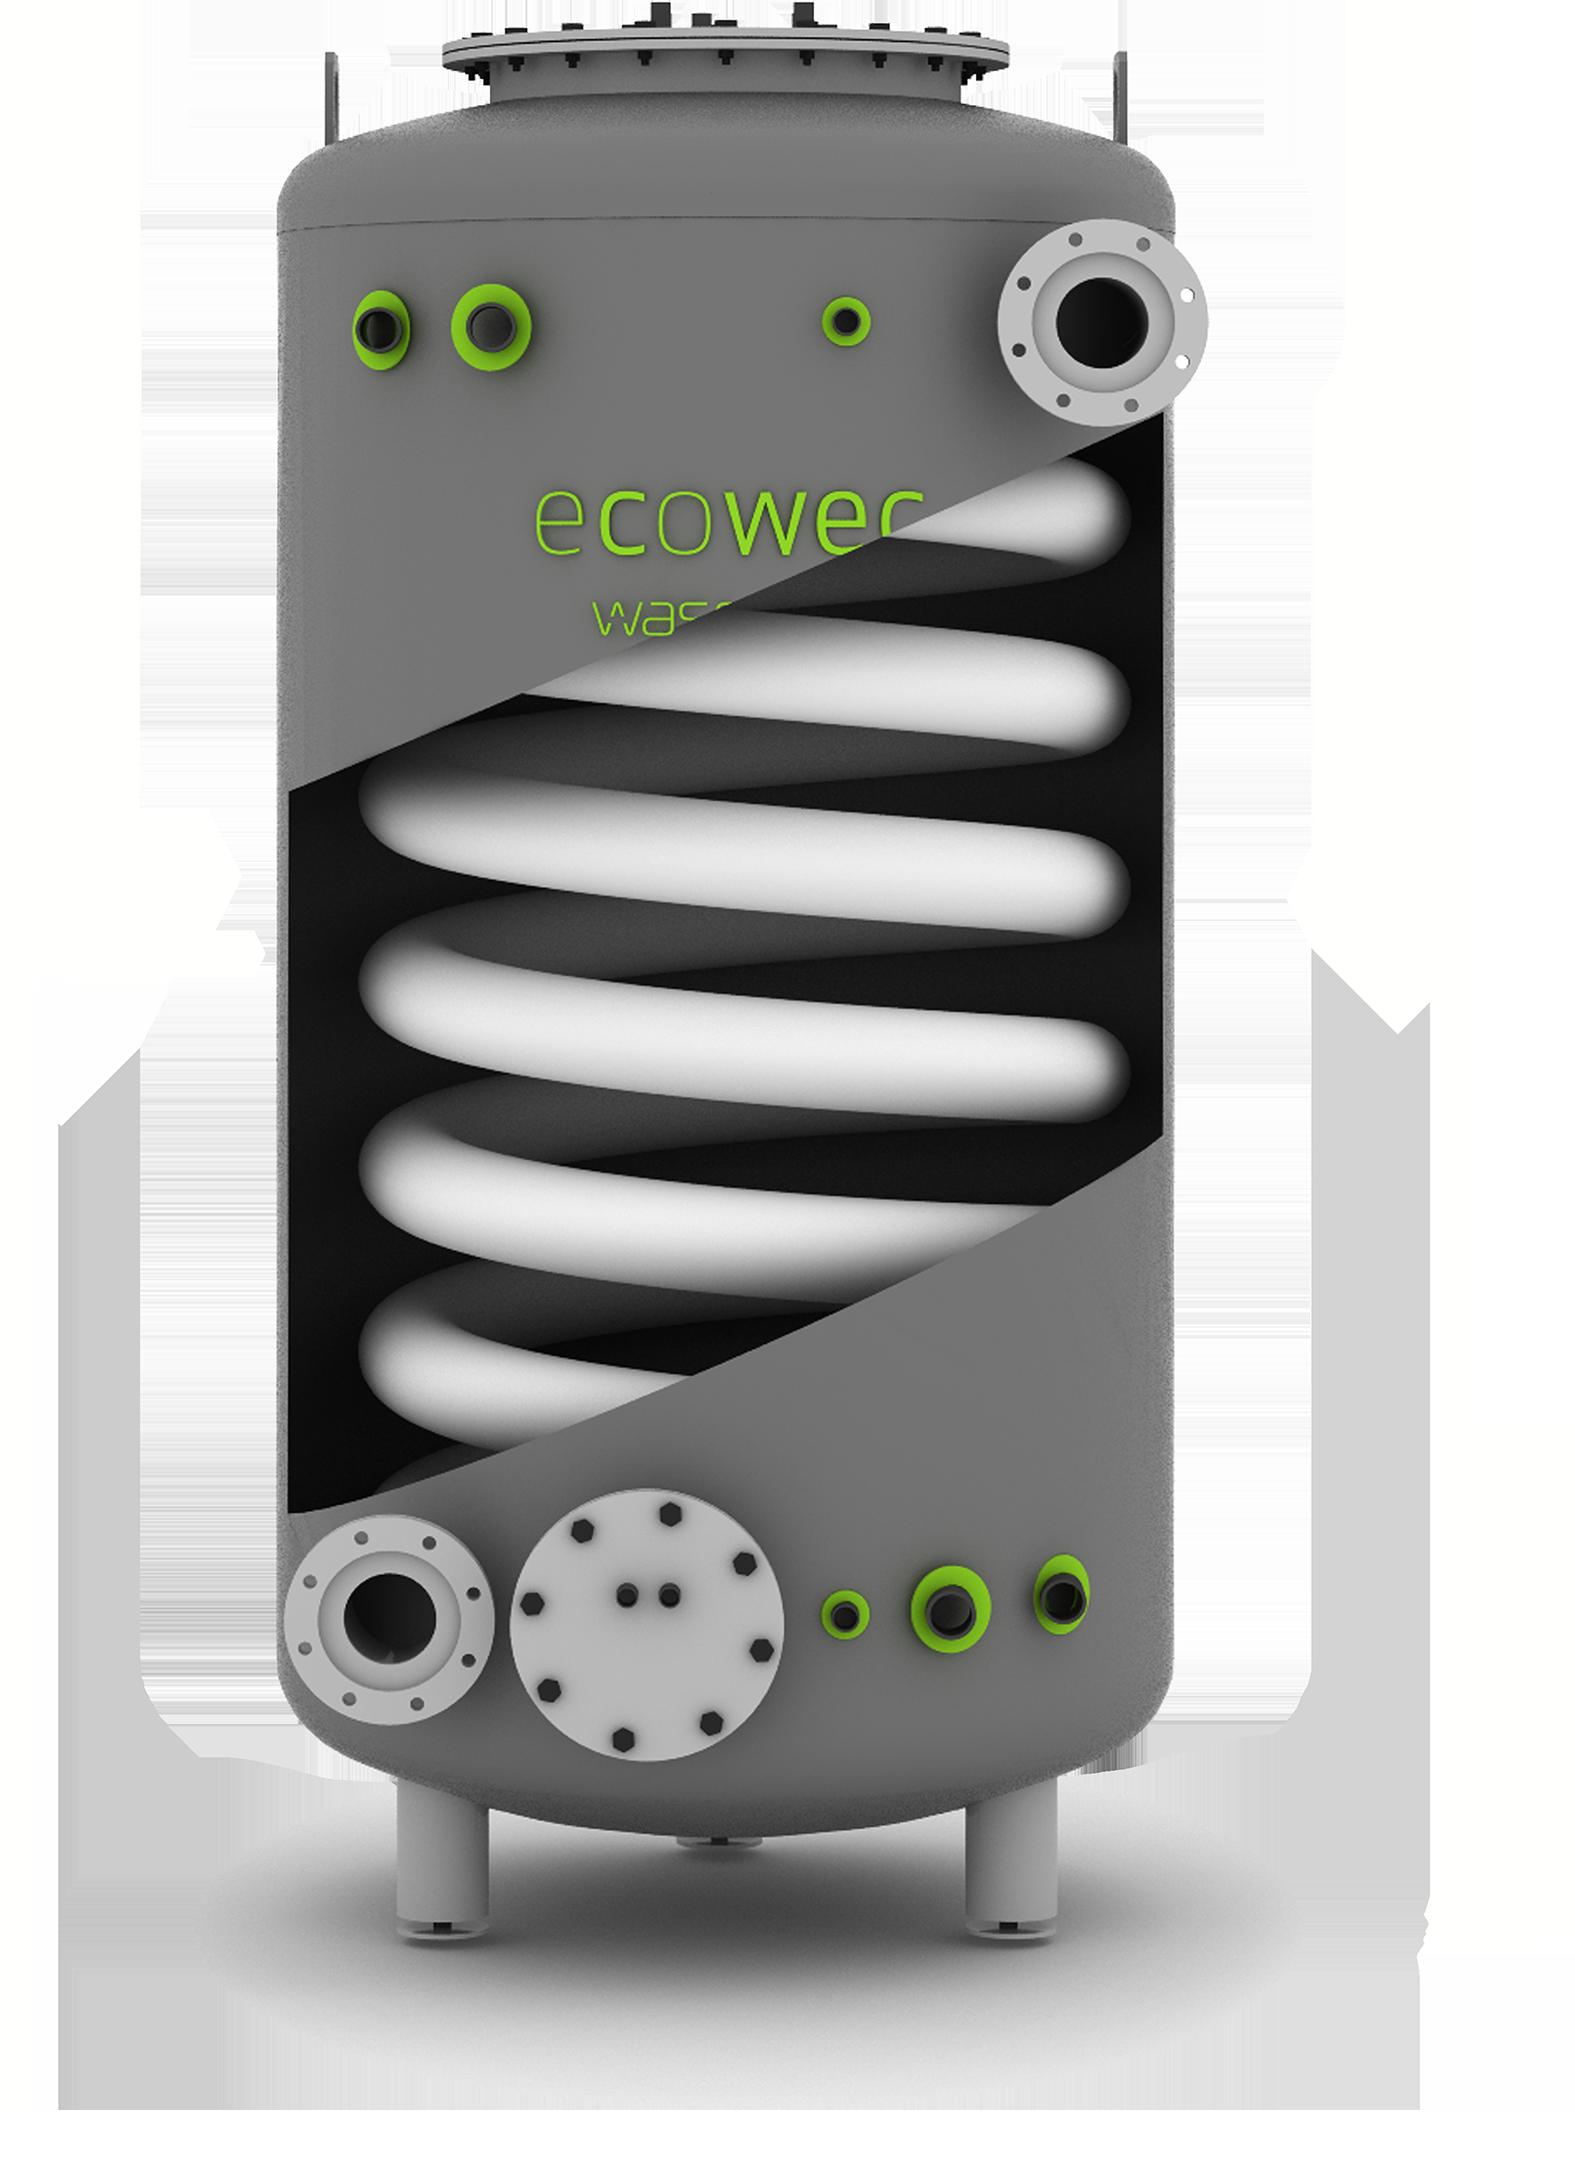 The Ecowec hybrid exchanger Wasenco